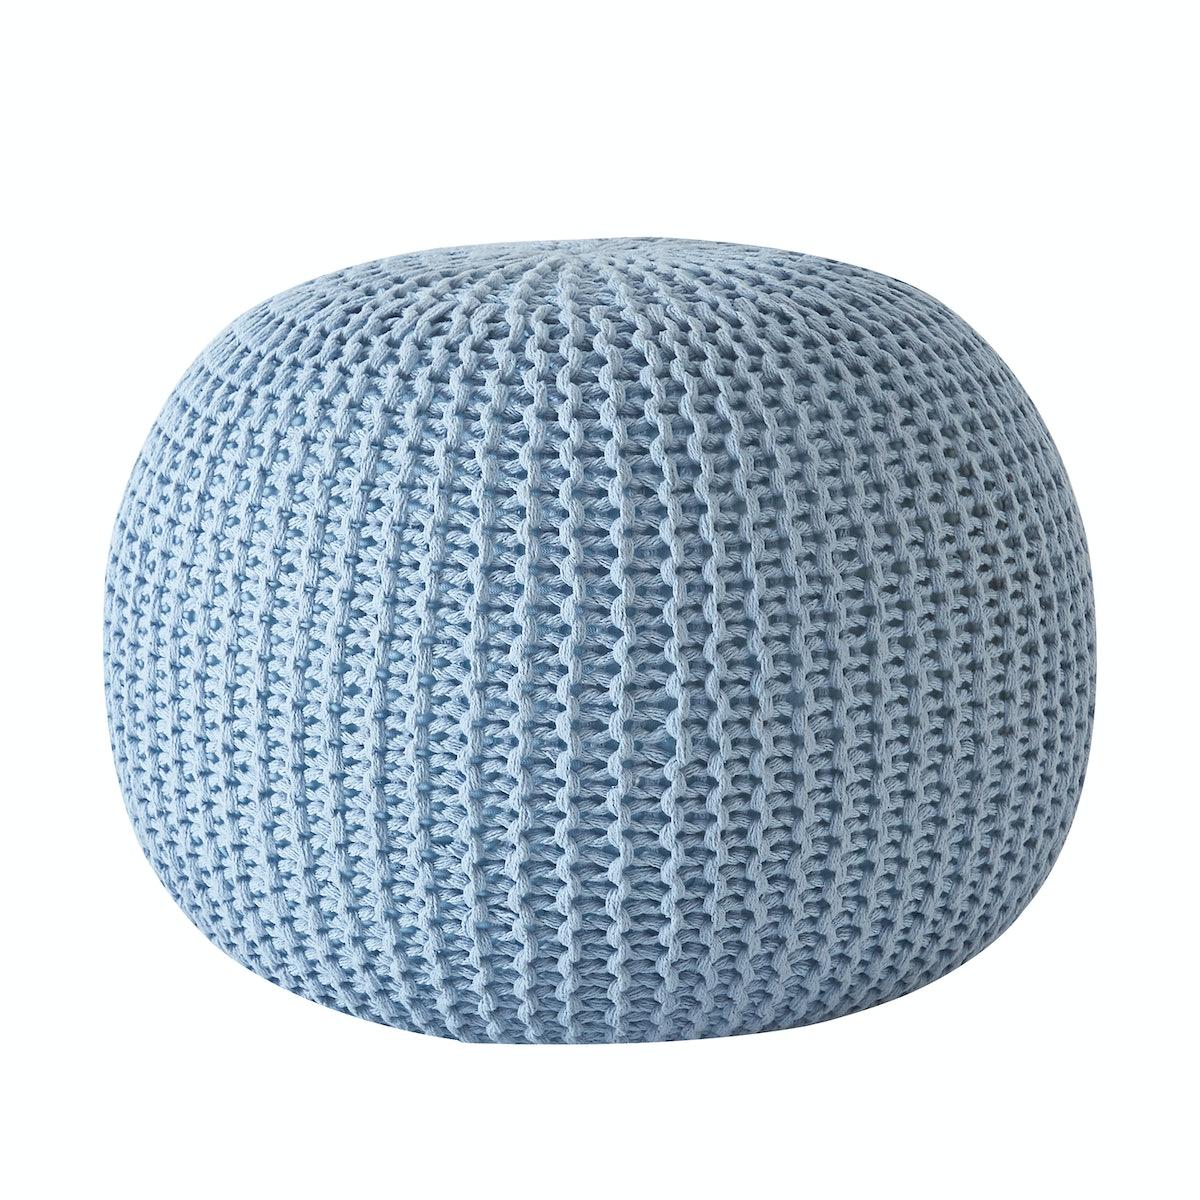 Round Knit Pouf